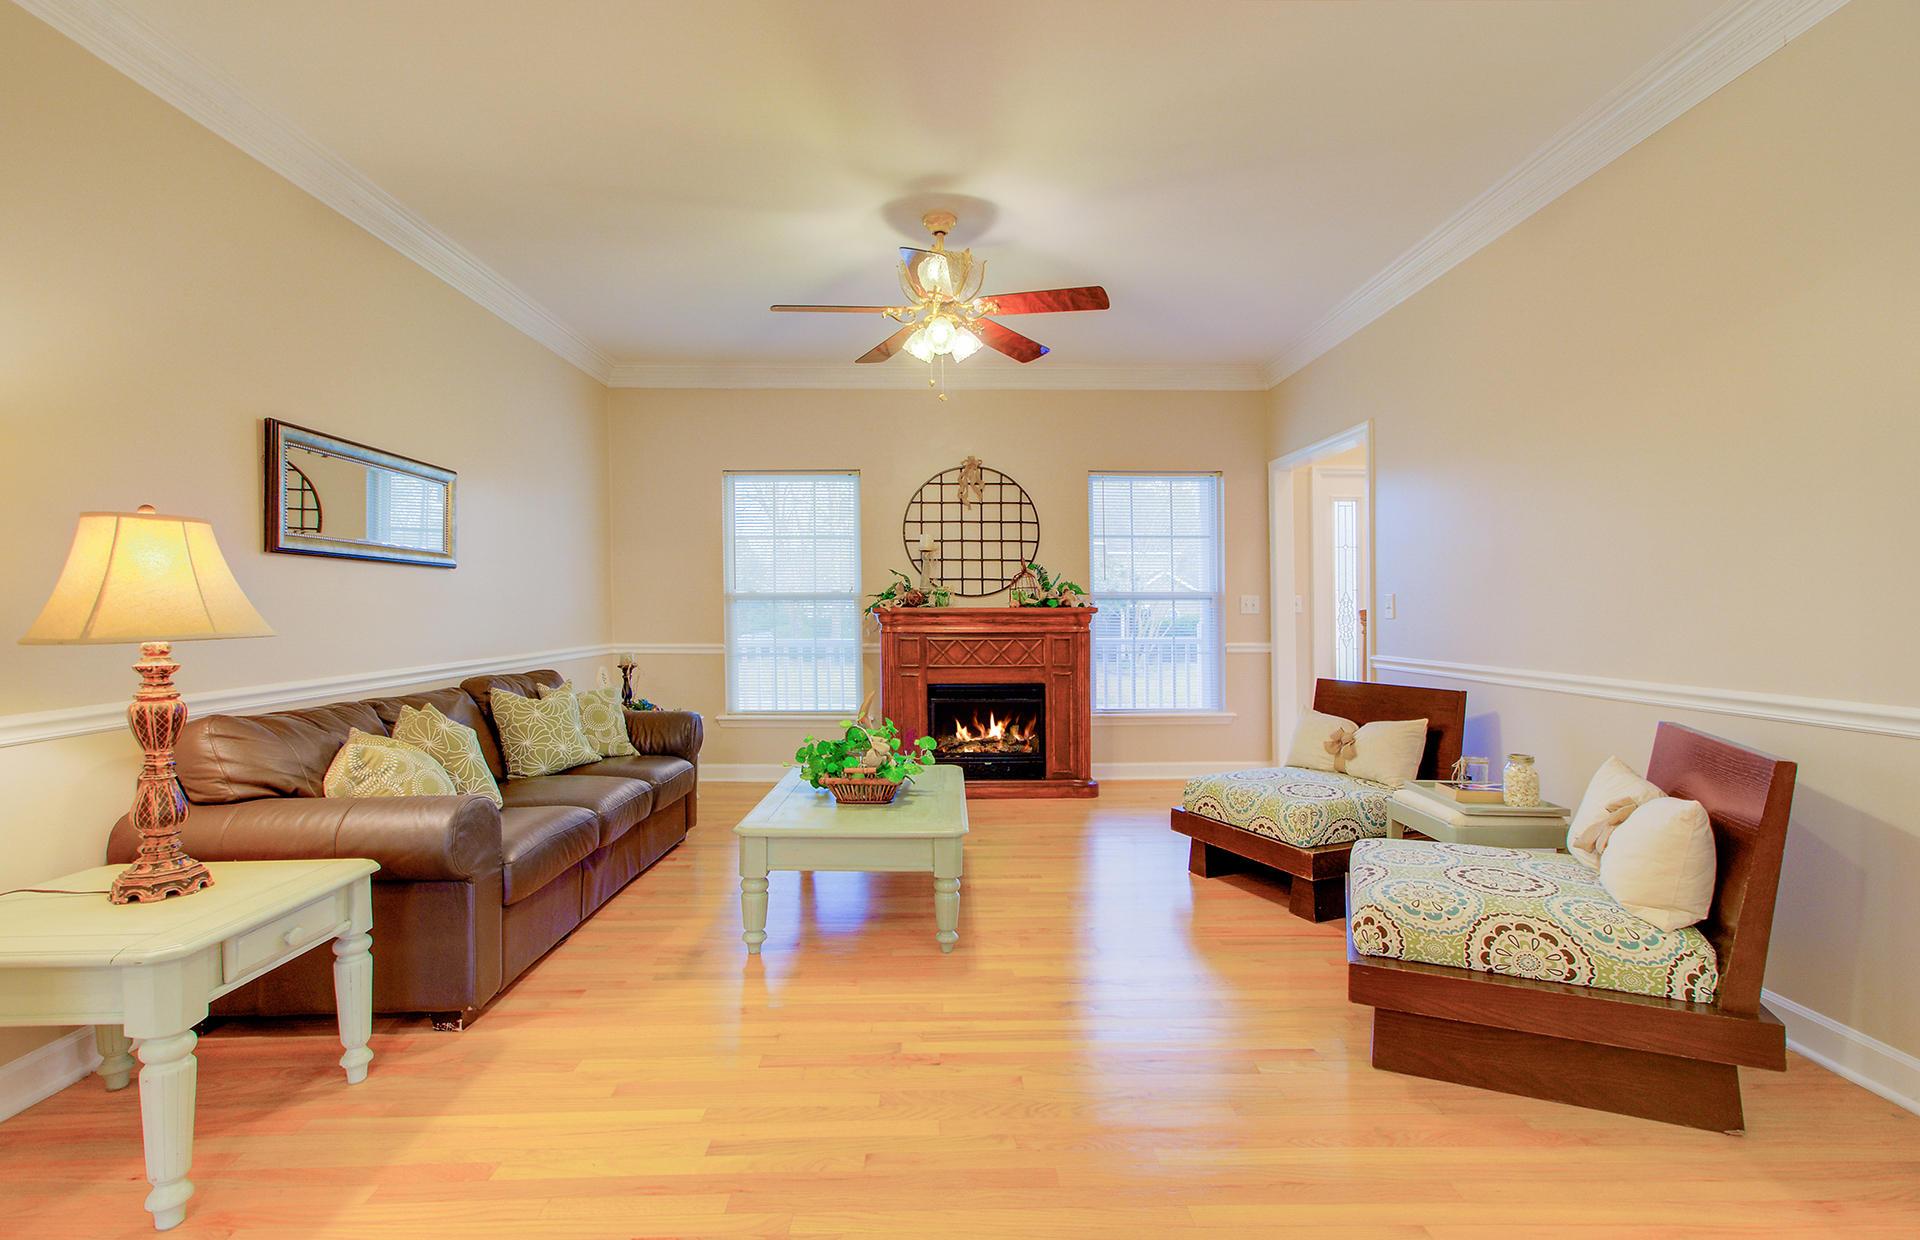 Bakers Landing Homes For Sale - 105 River Oak, North Charleston, SC - 27